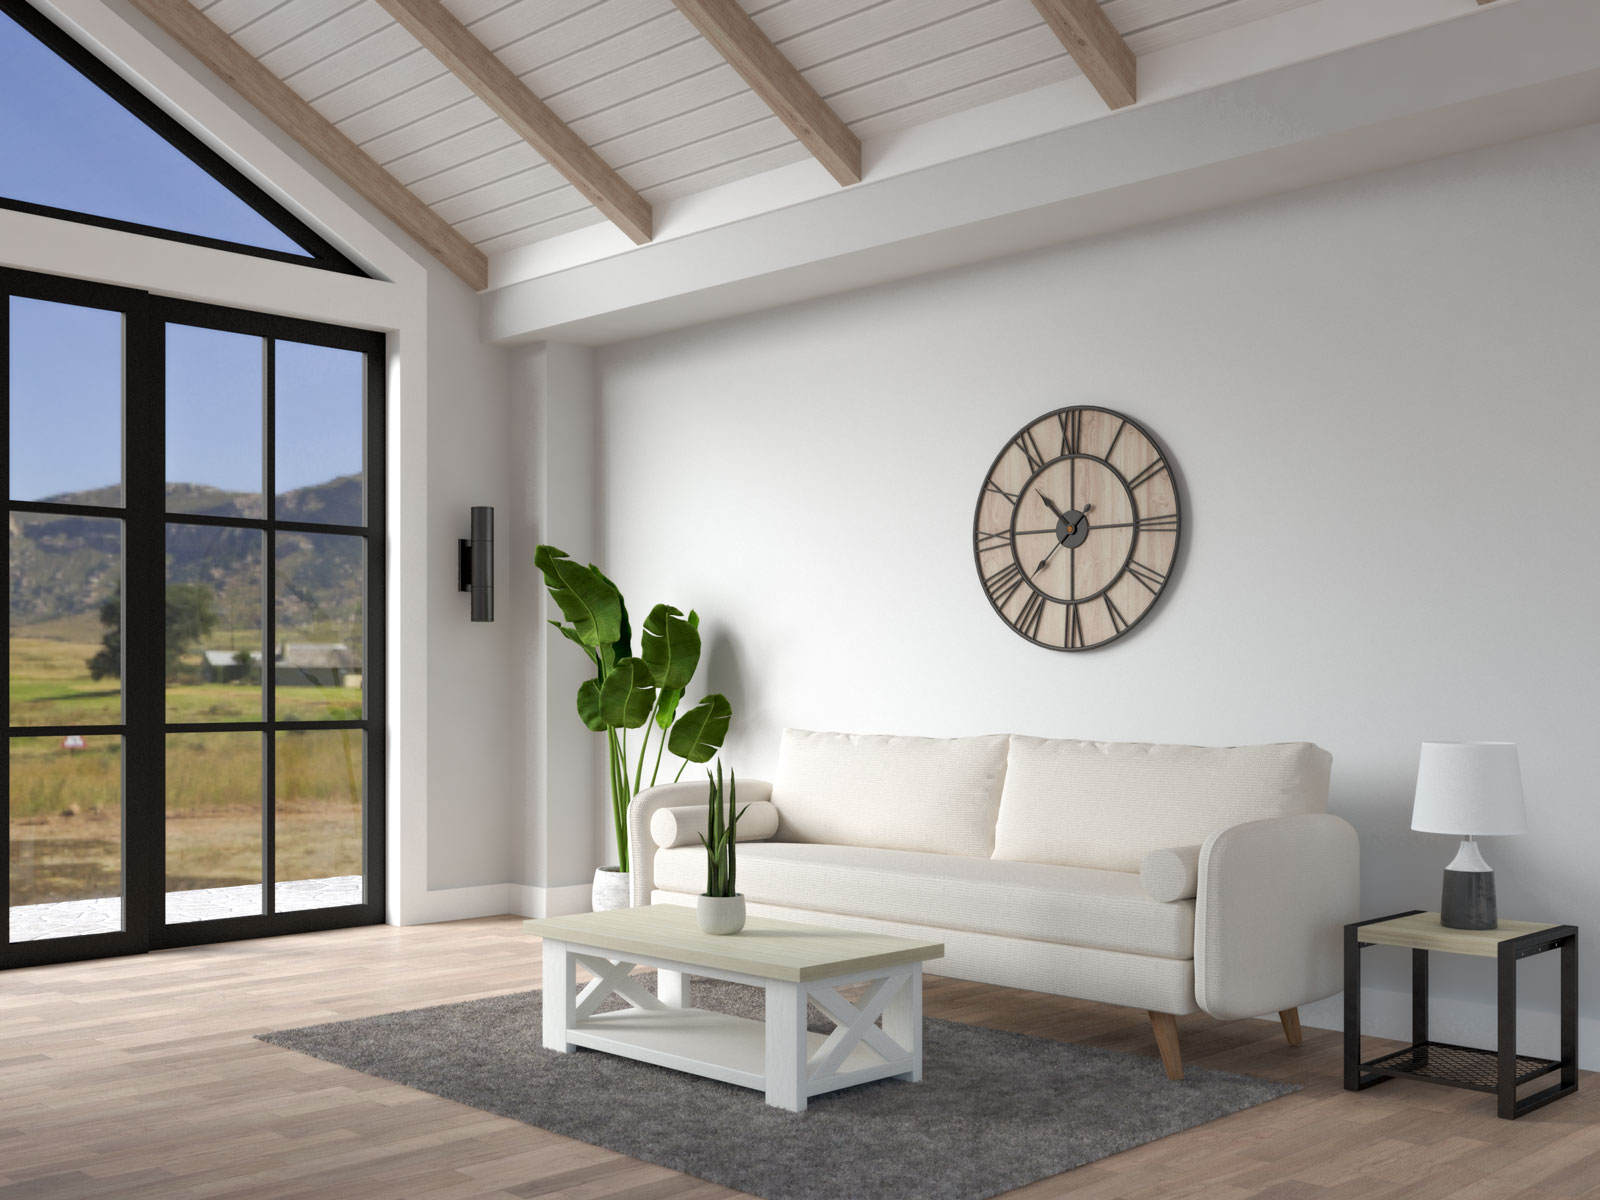 Light gray living room with farmhouse decor